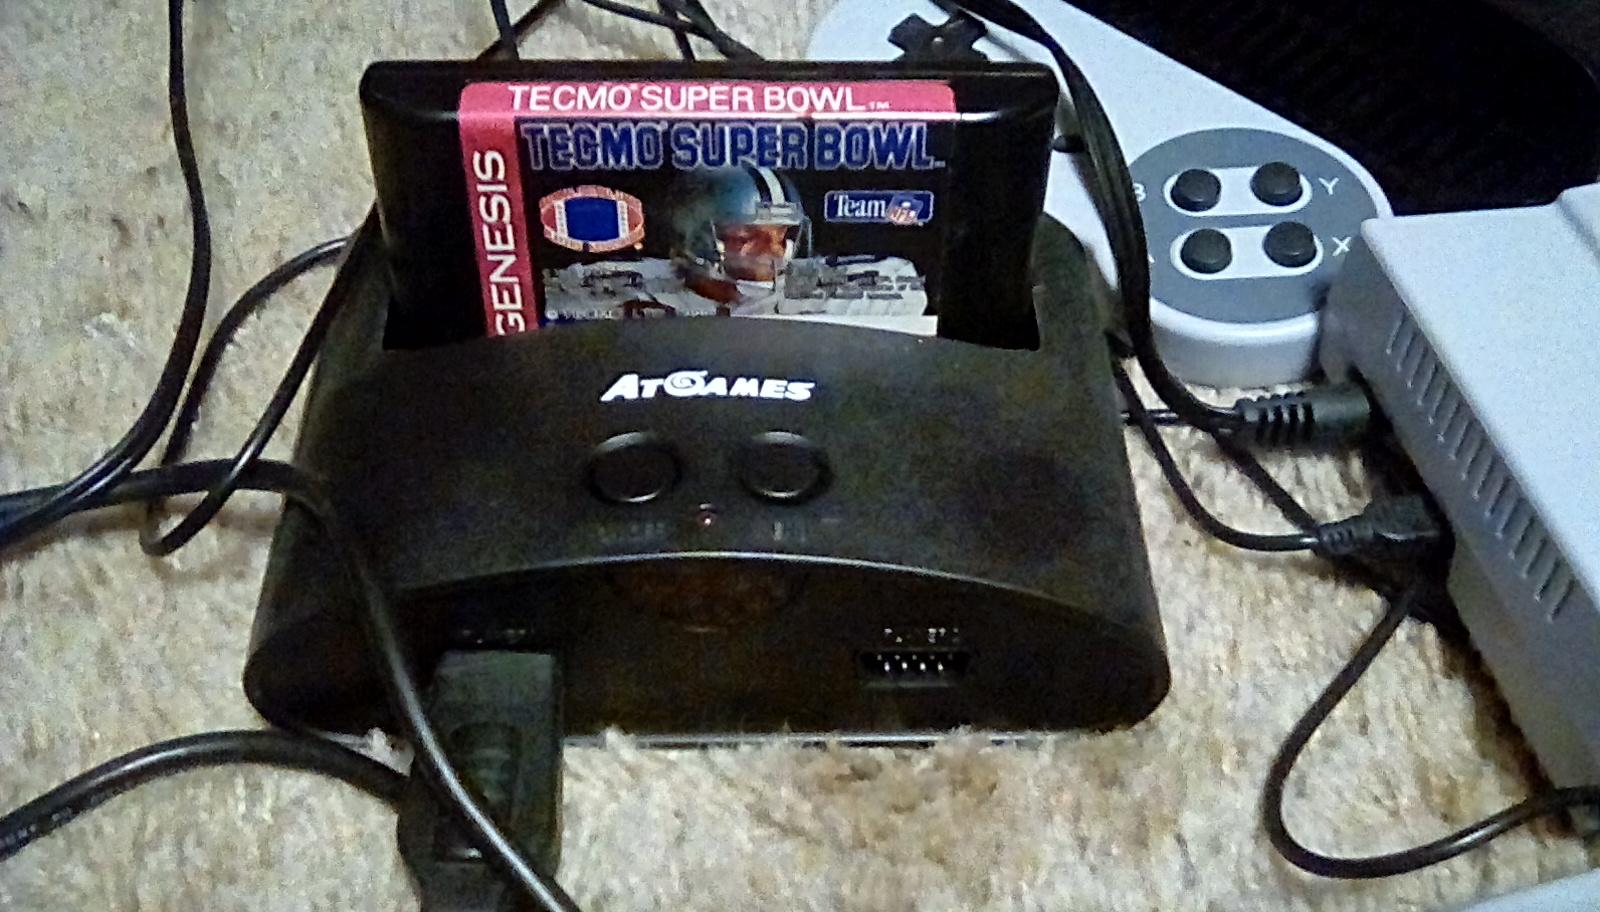 JML101582: Tecmo Super Bowl [Most Receiving Yards] [Pro Bowl] (Sega Genesis / MegaDrive Emulated) 572 points on 2019-01-19 20:11:50